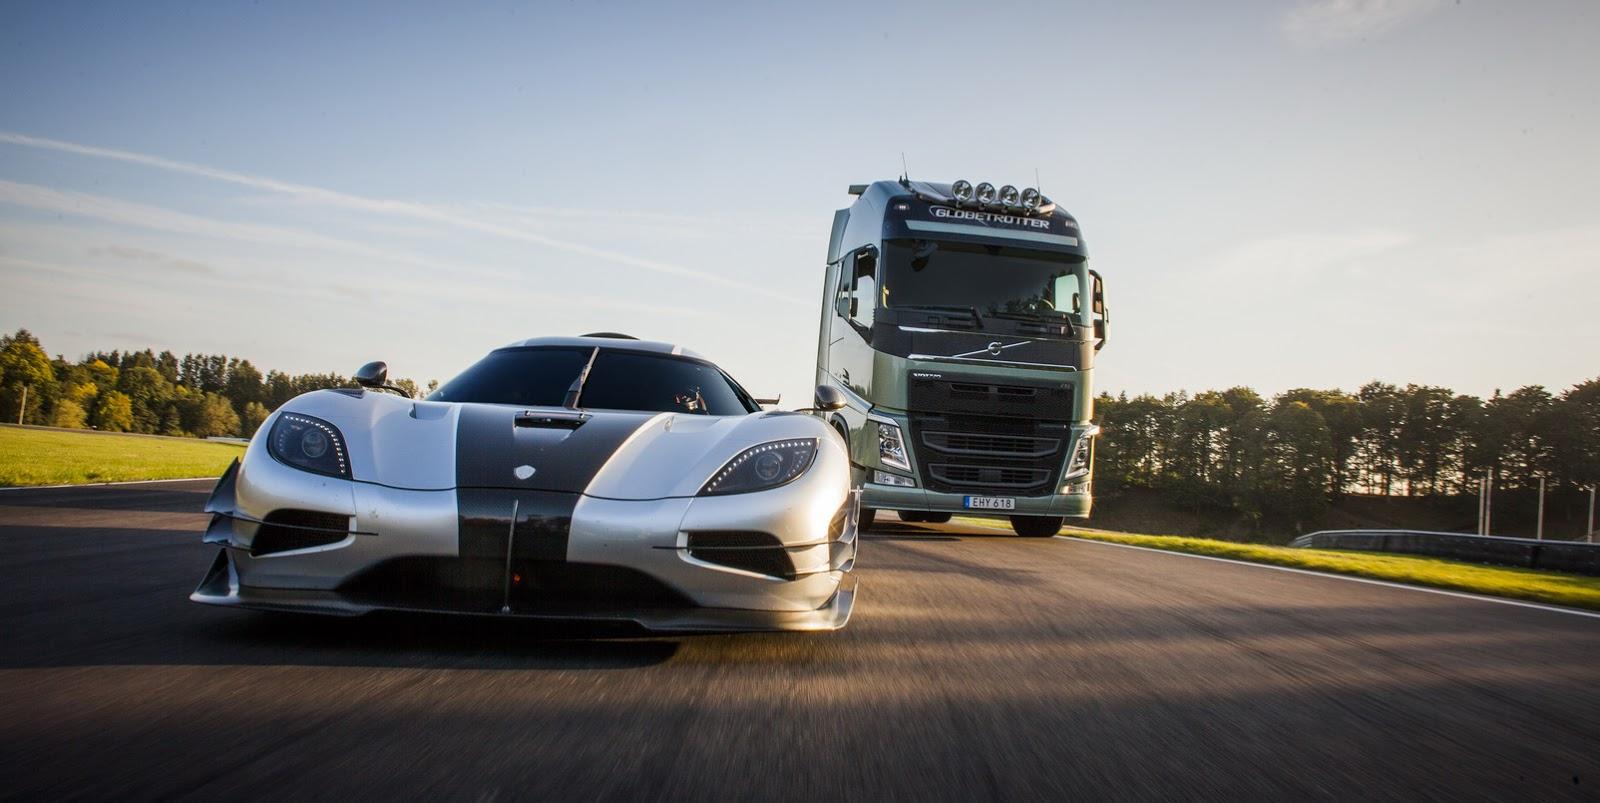 Fastest Car In The World Wallpaper Volvo Trucks To Challenge Koenigsegg One 1 In New Spot